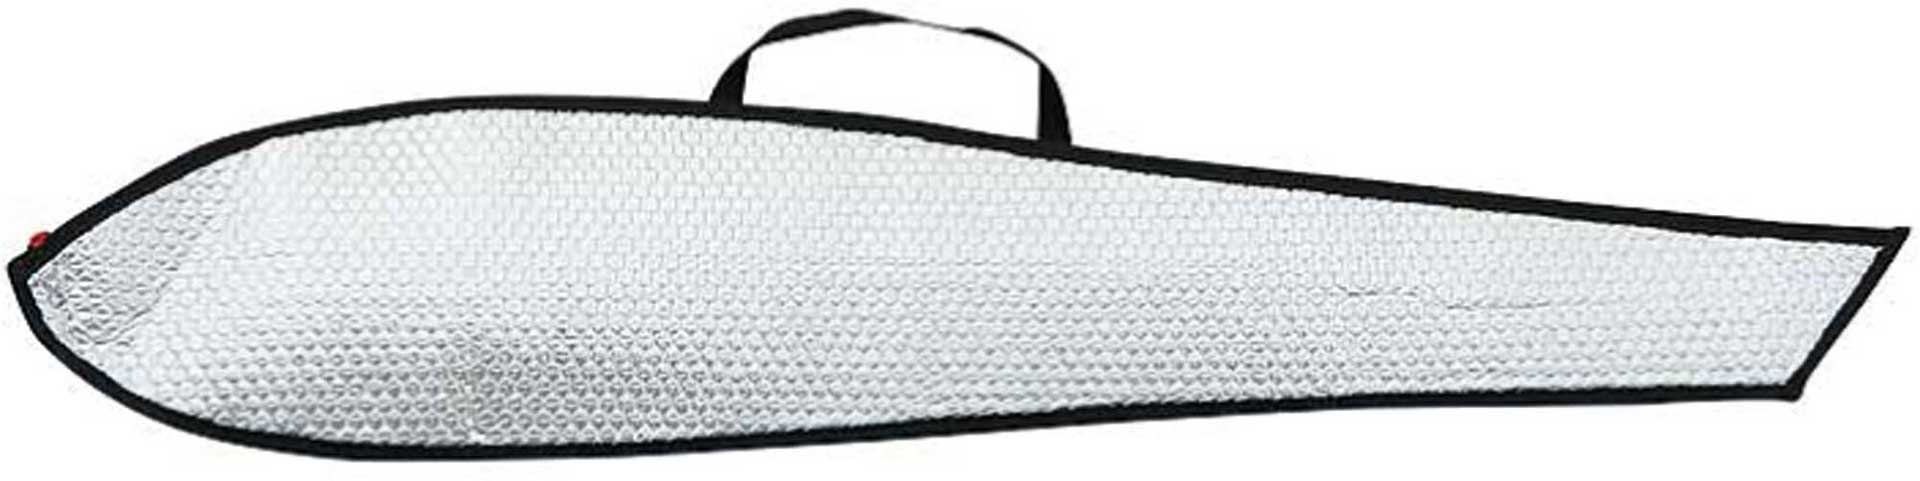 MULTIPLEX Hull protection bag Lentus